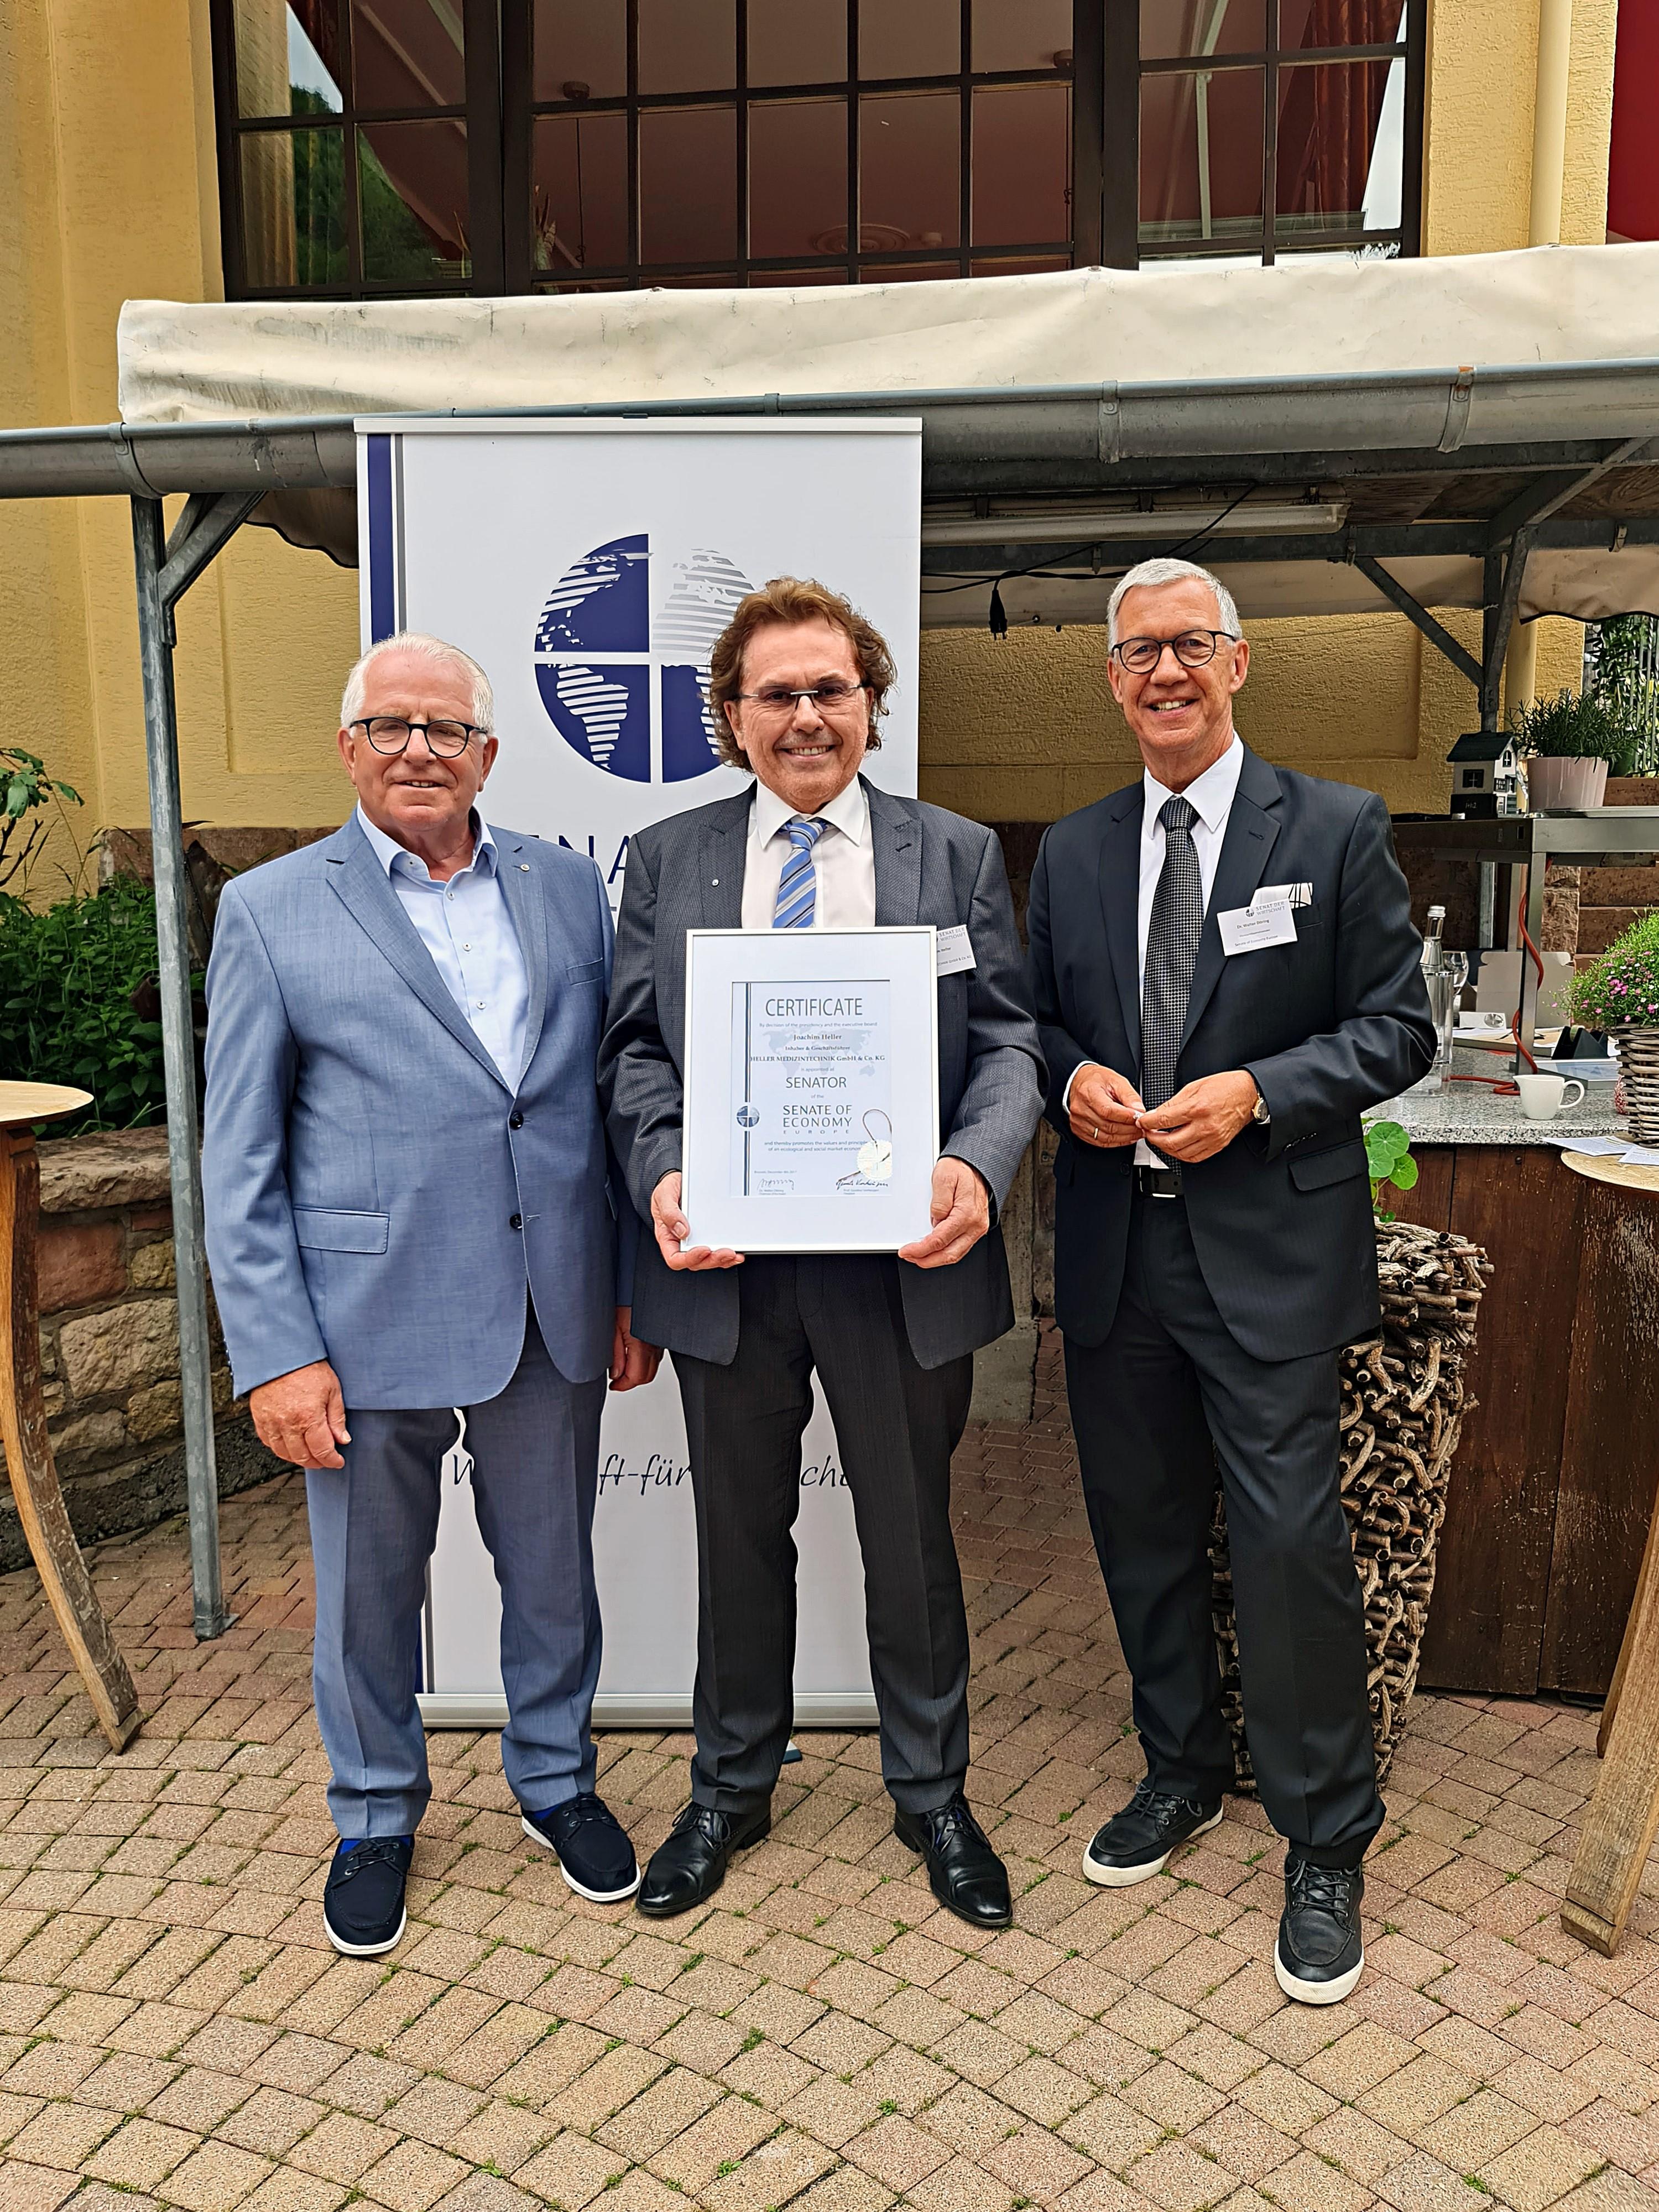 v.l.n.r.: Dieter Härthe, Joachim Heller, Dr. Walter Döring